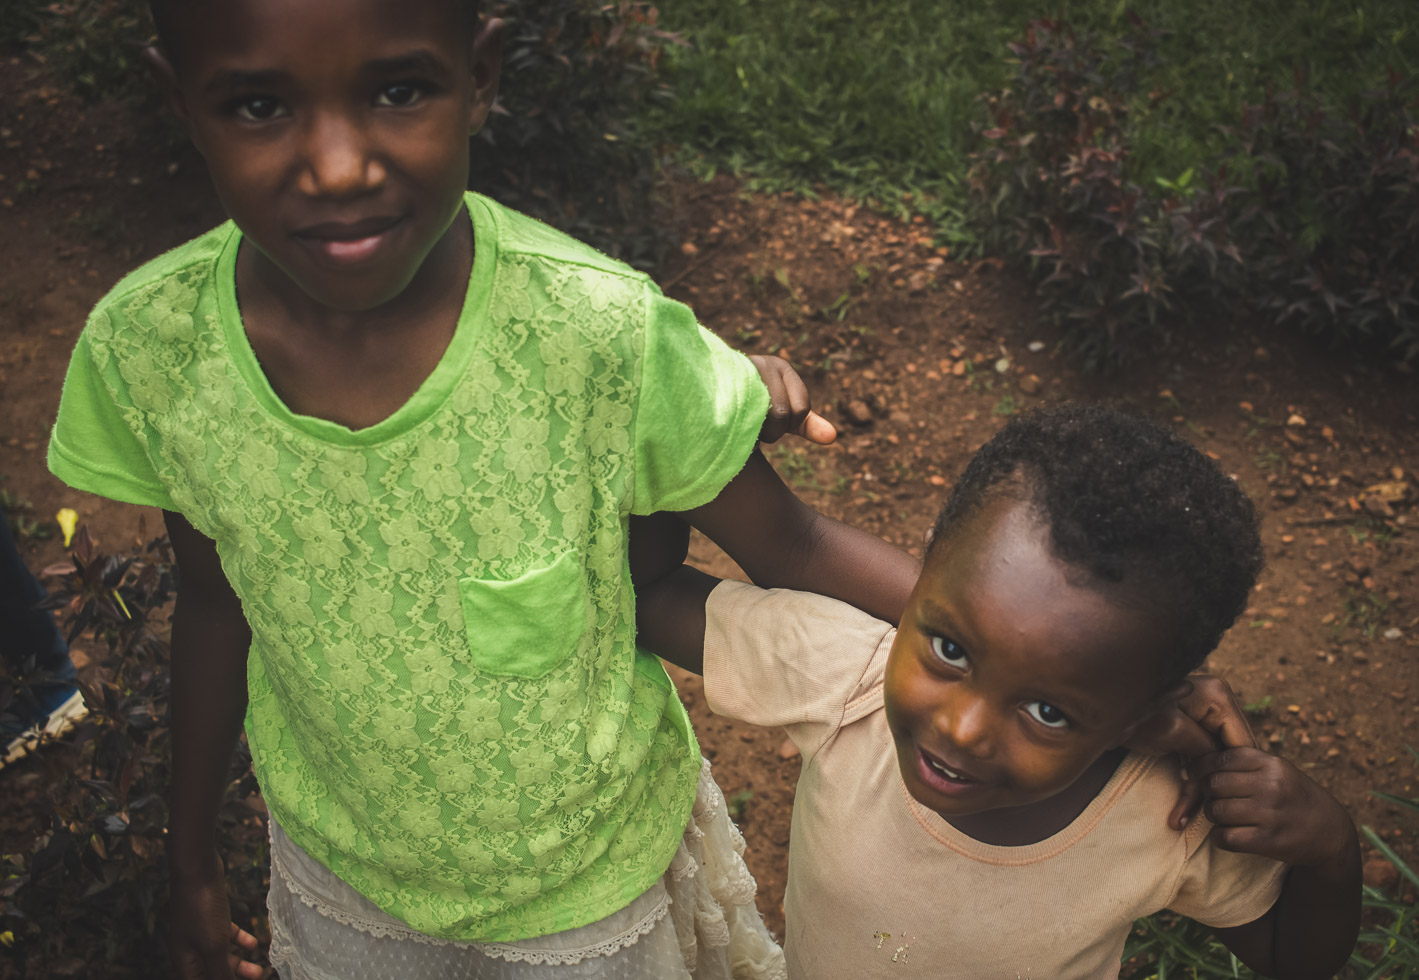 Sister in a loving embrace, choosing joy, advocating hope